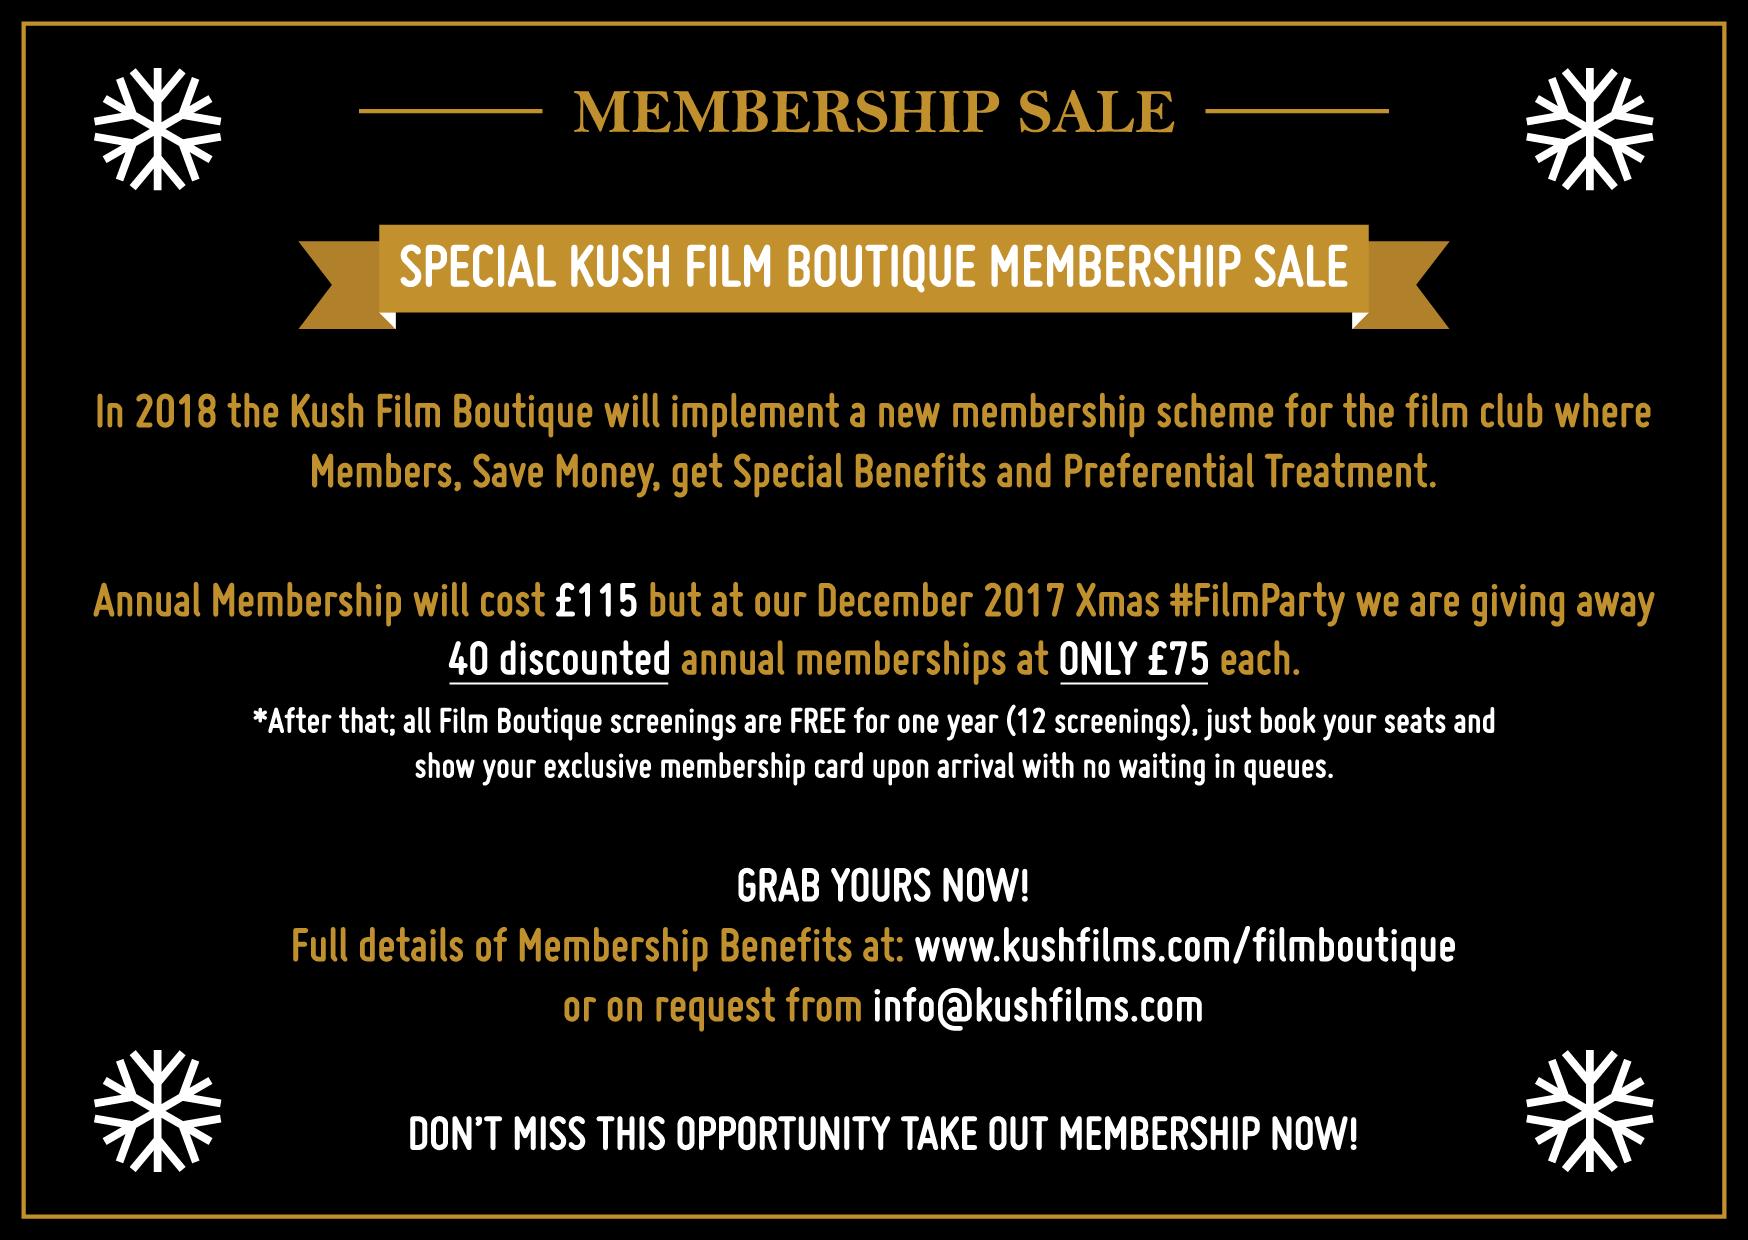 Kush Film Boutique Membership